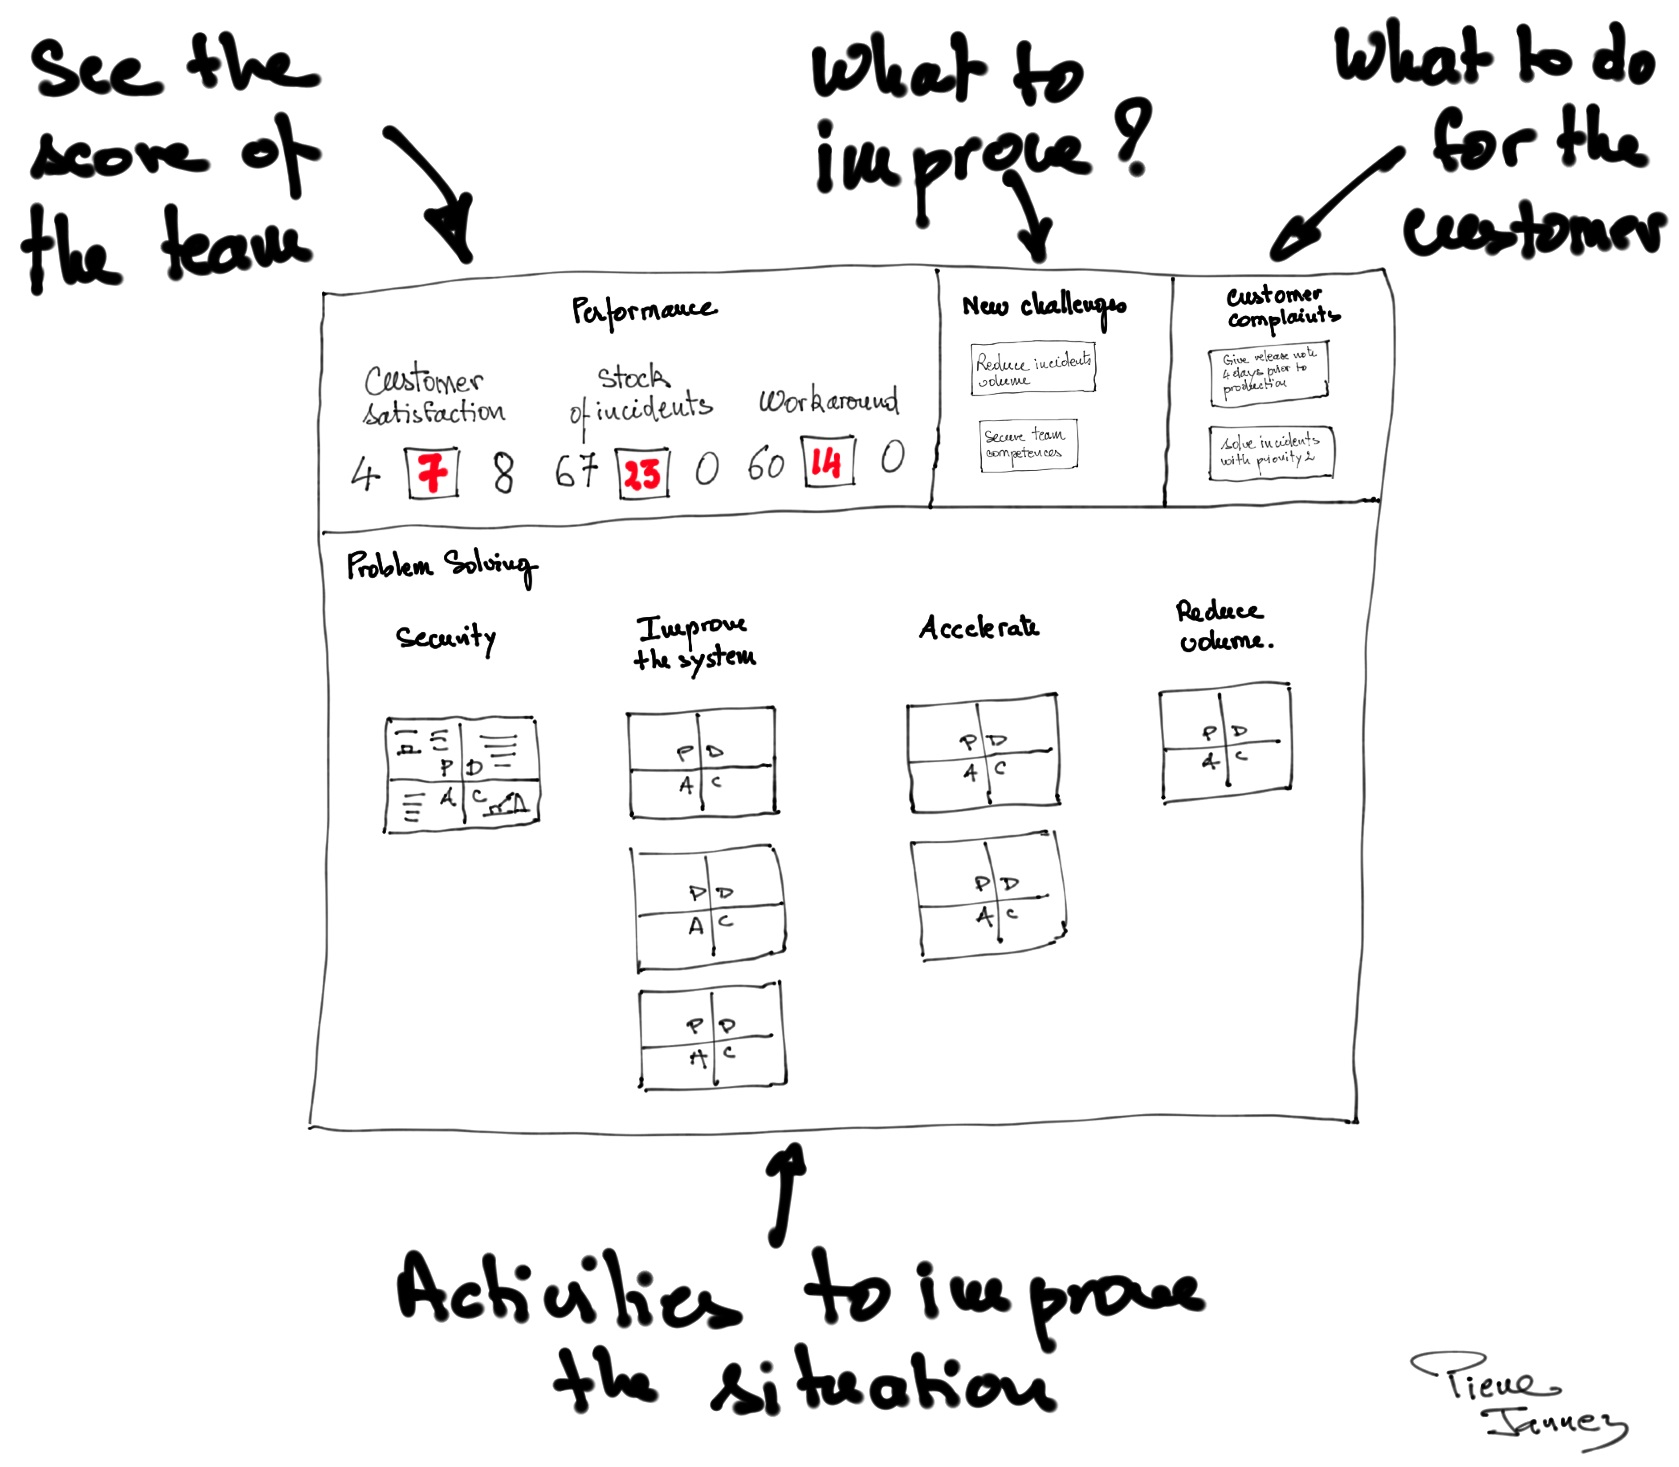 Pierre-Jannez-visual-management-performance-problem-solving-board-operae-partners